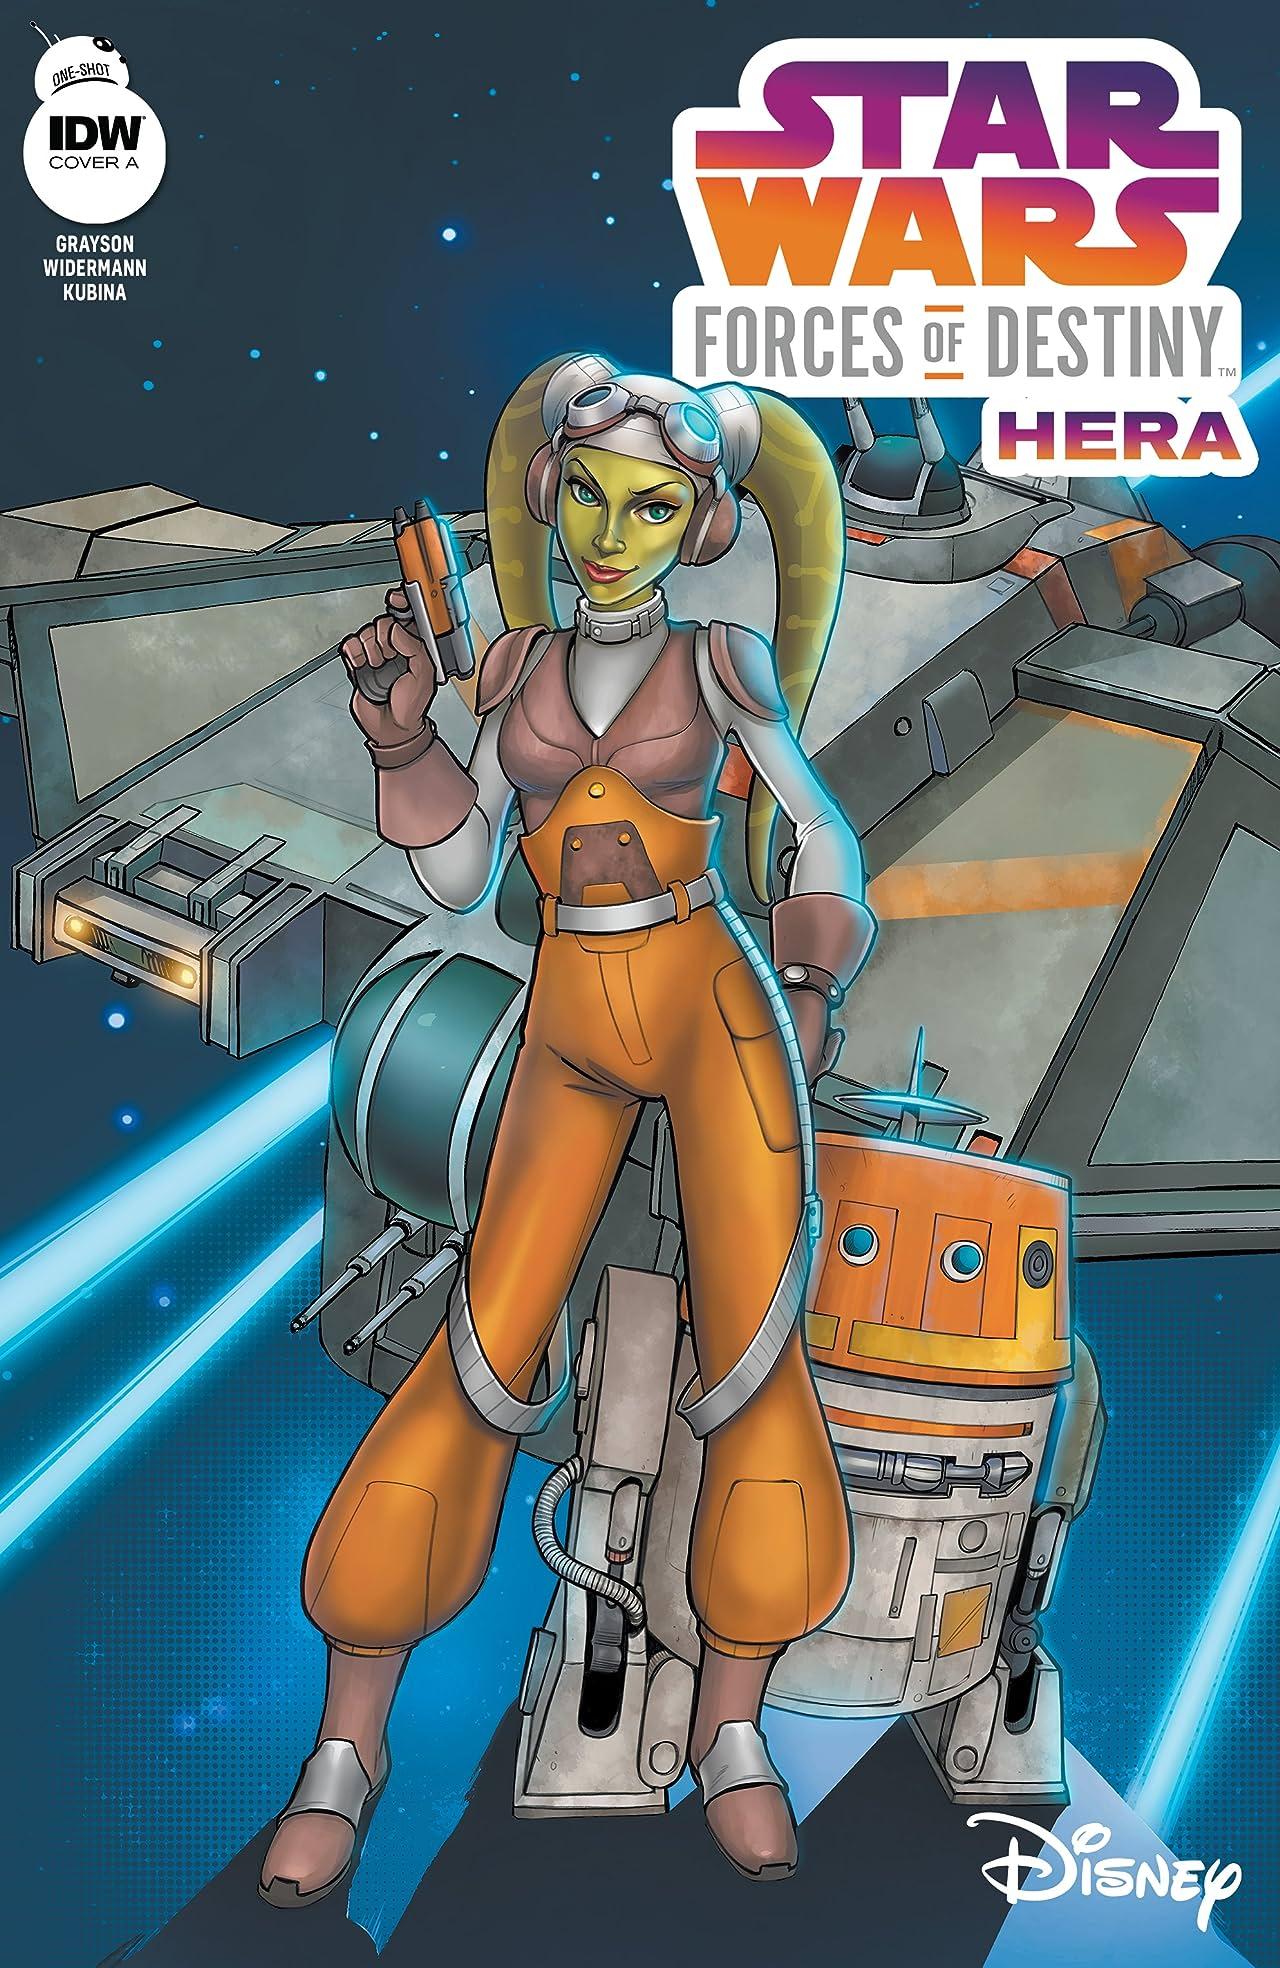 Star Wars Adventures: Forces of Destiny—Hera